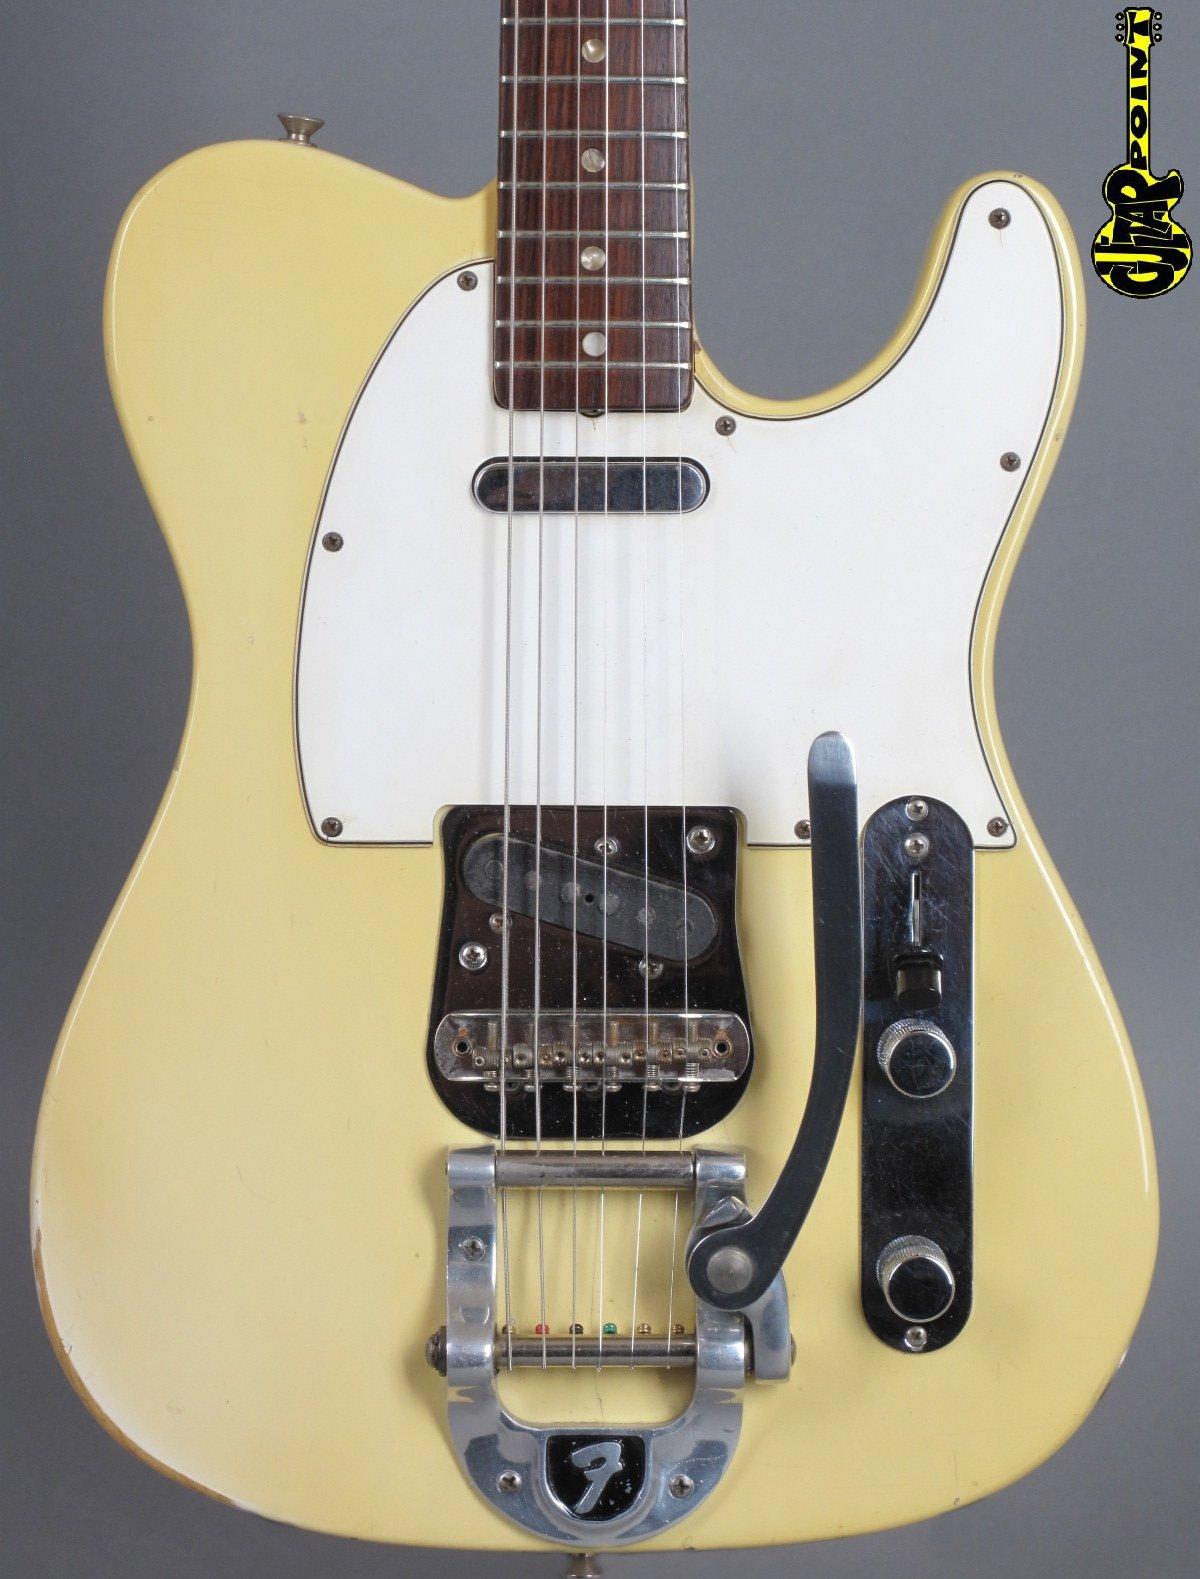 1969 Fender Telecaster - Blond / Bigsby